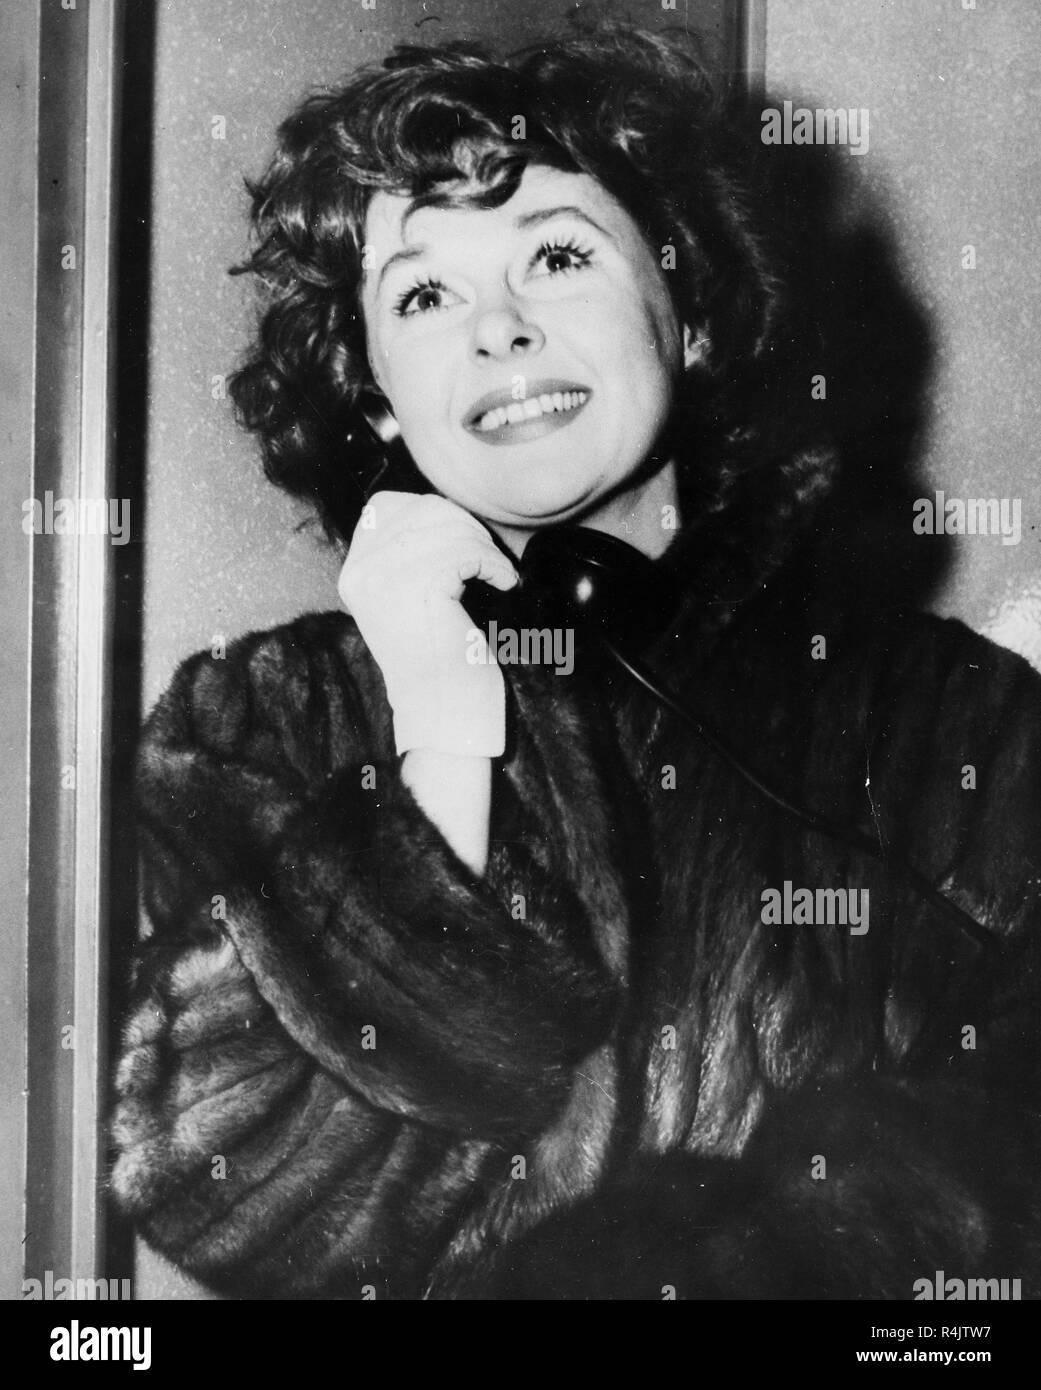 susan hayward, new york, 1956 - Stock Image